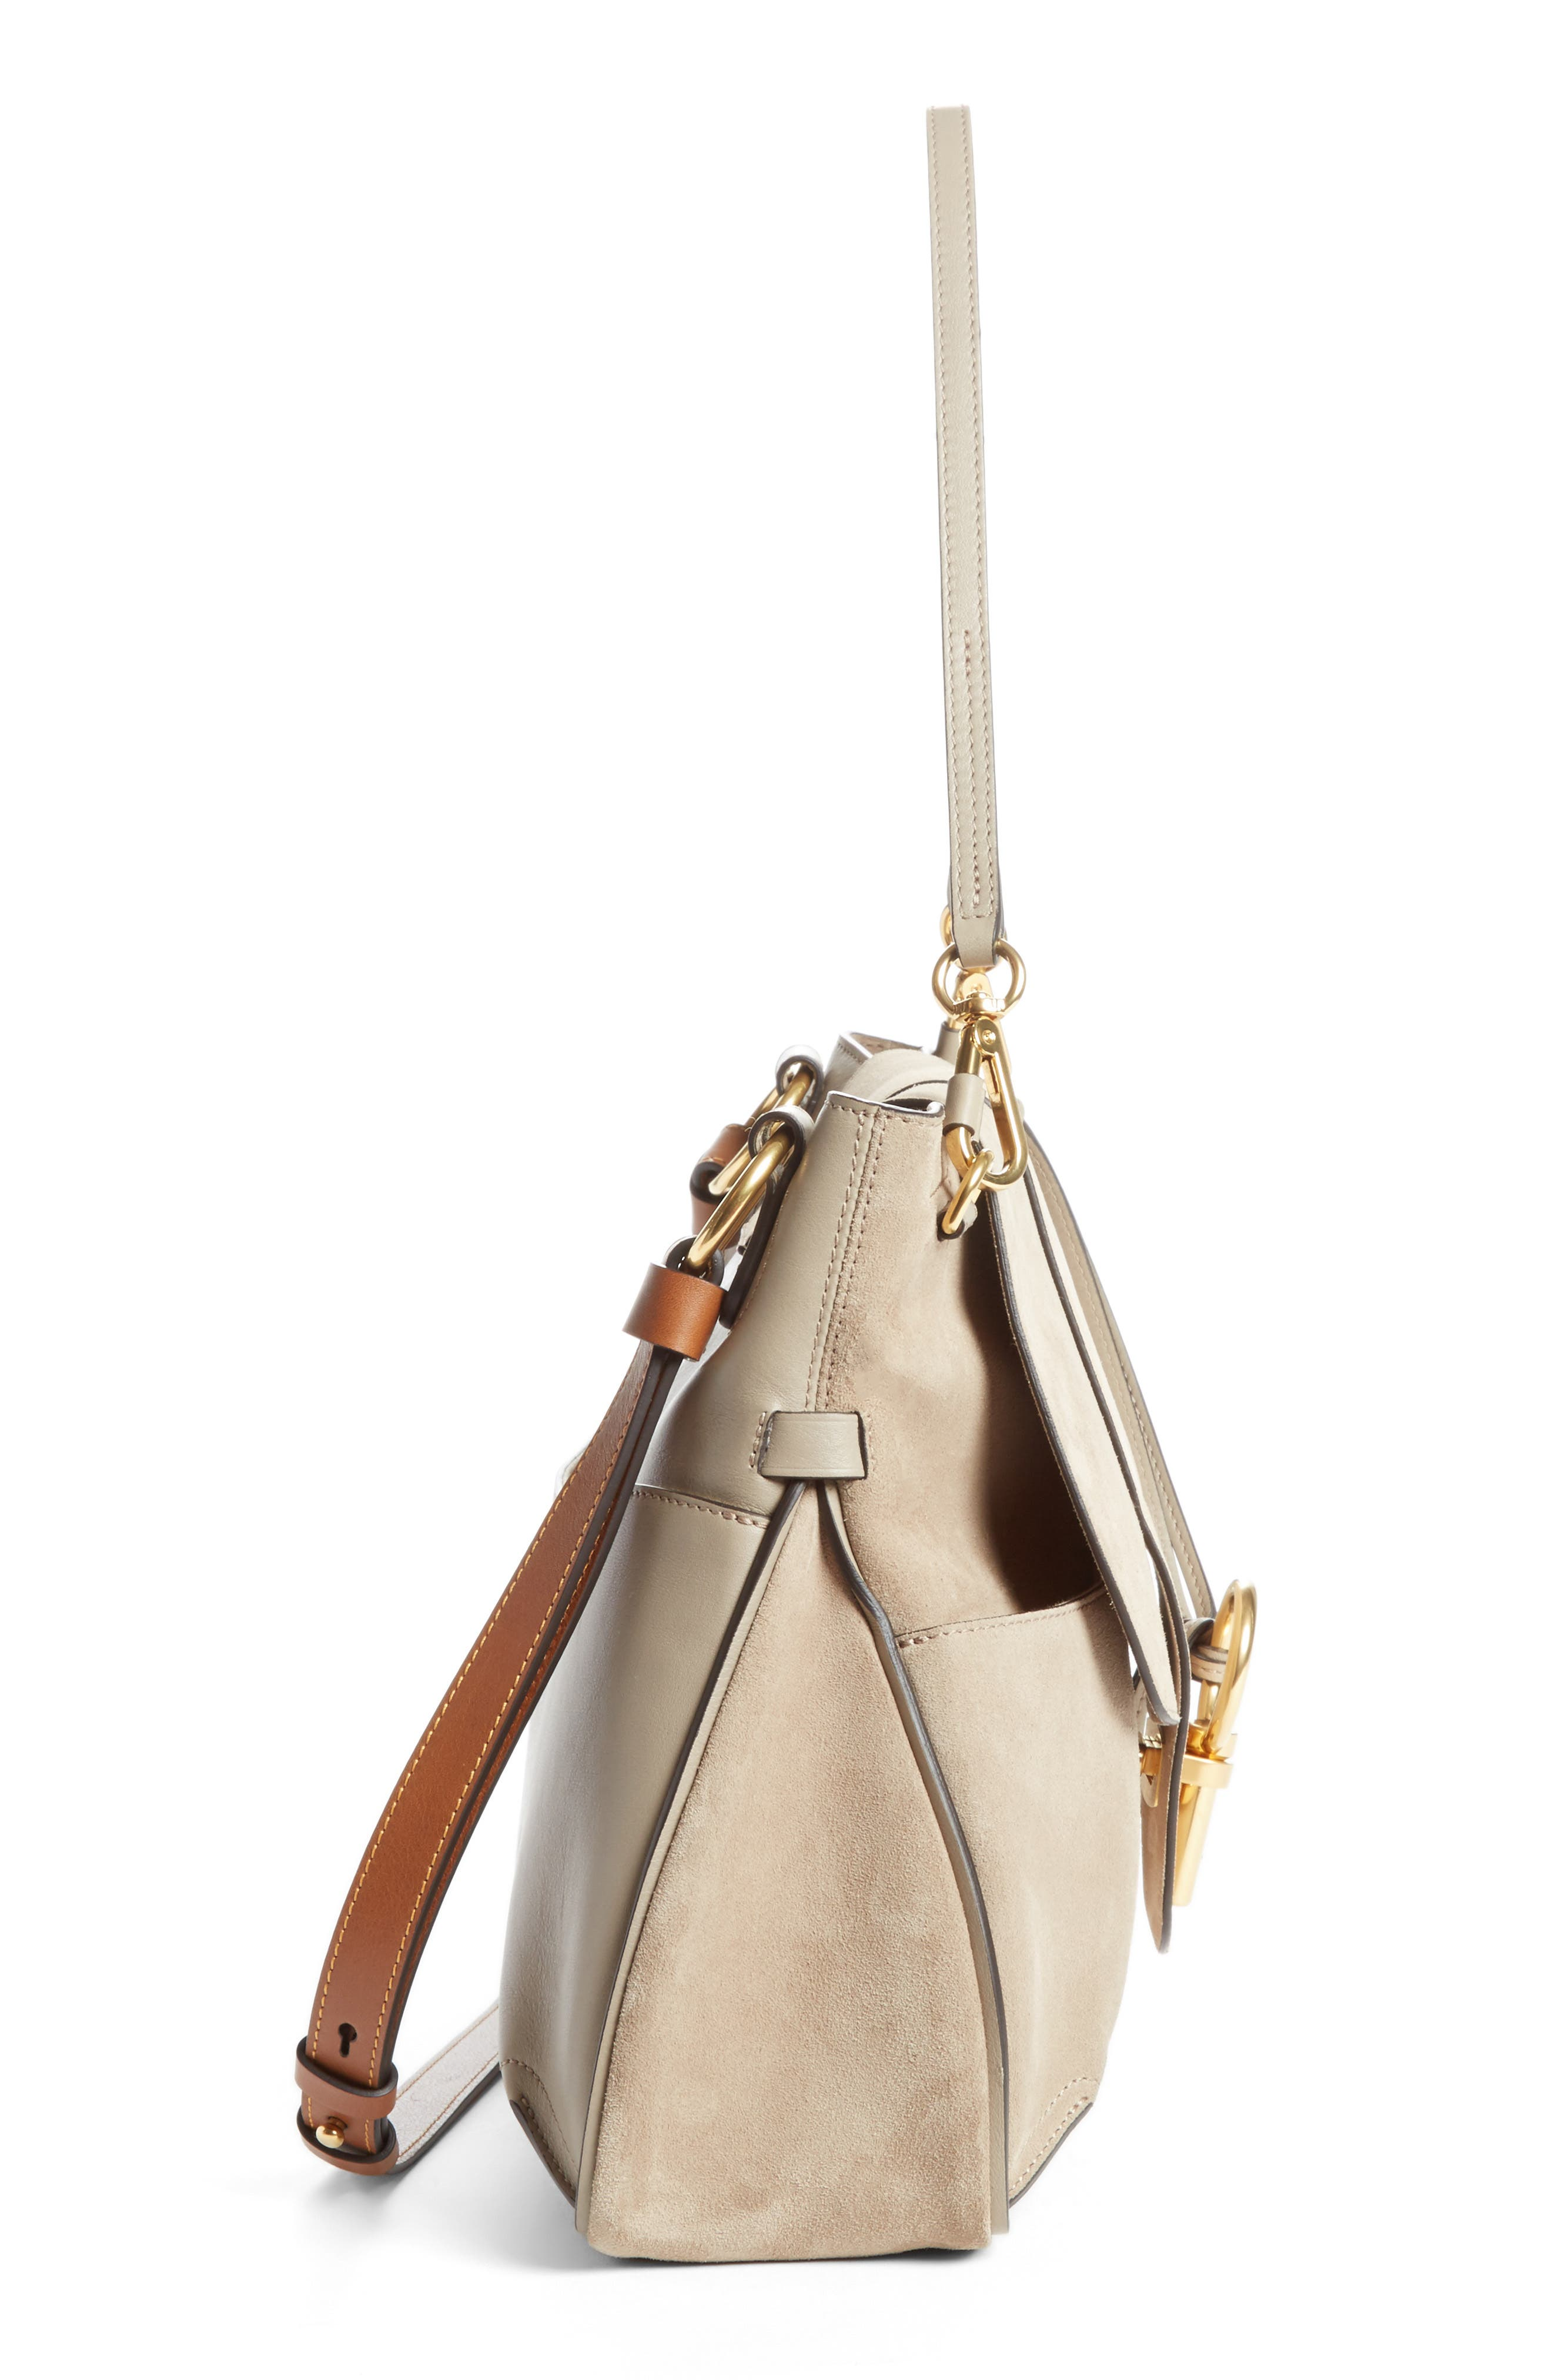 Medium Lexa Leather Shoulder Bag,                             Alternate thumbnail 3, color,                             031